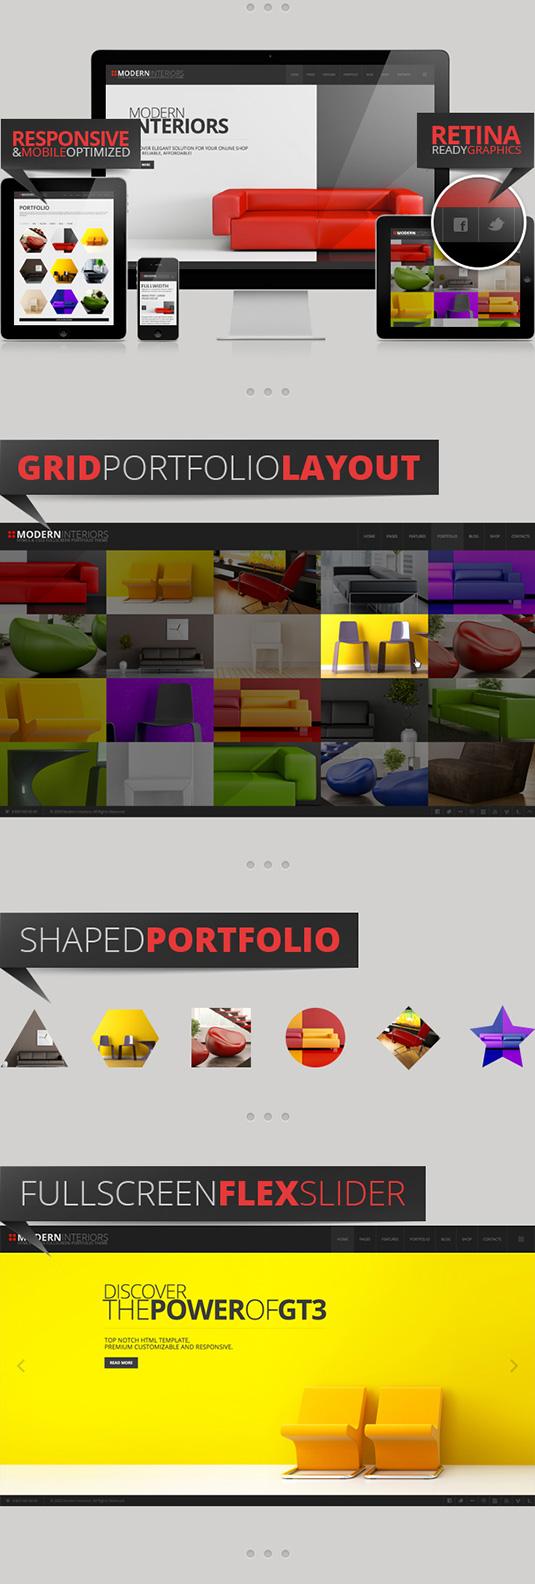 Modern Interior Responsive Bootstrap Template